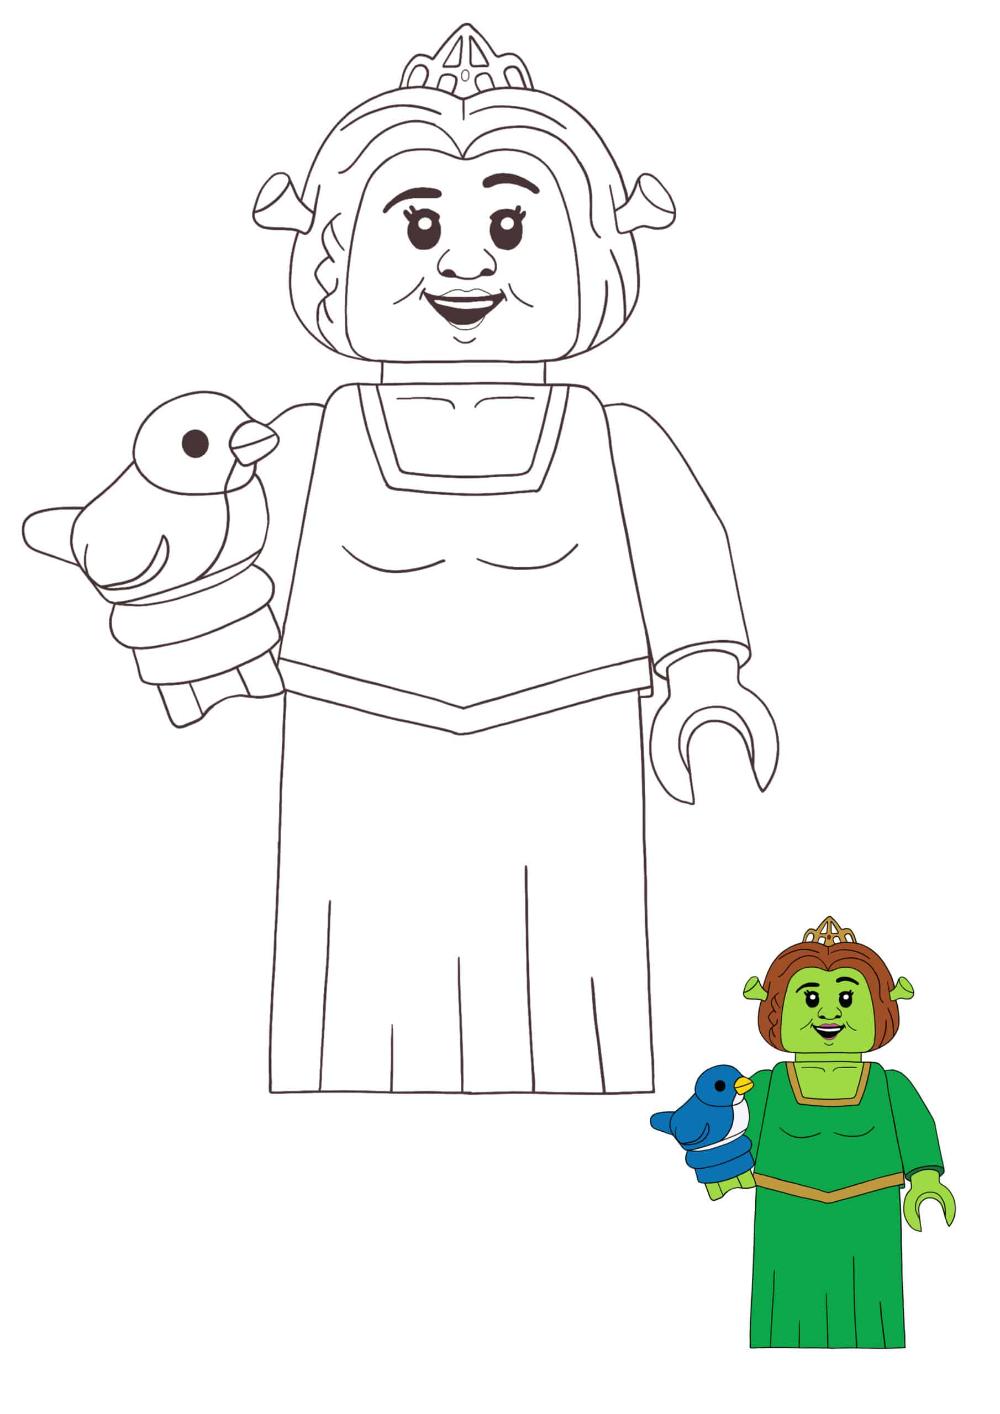 Lego Princess Fiona Coloring Pages 2 Free Coloring Sheets 2020 Princess Coloring Pages Princess Fiona Disney Princess Anime